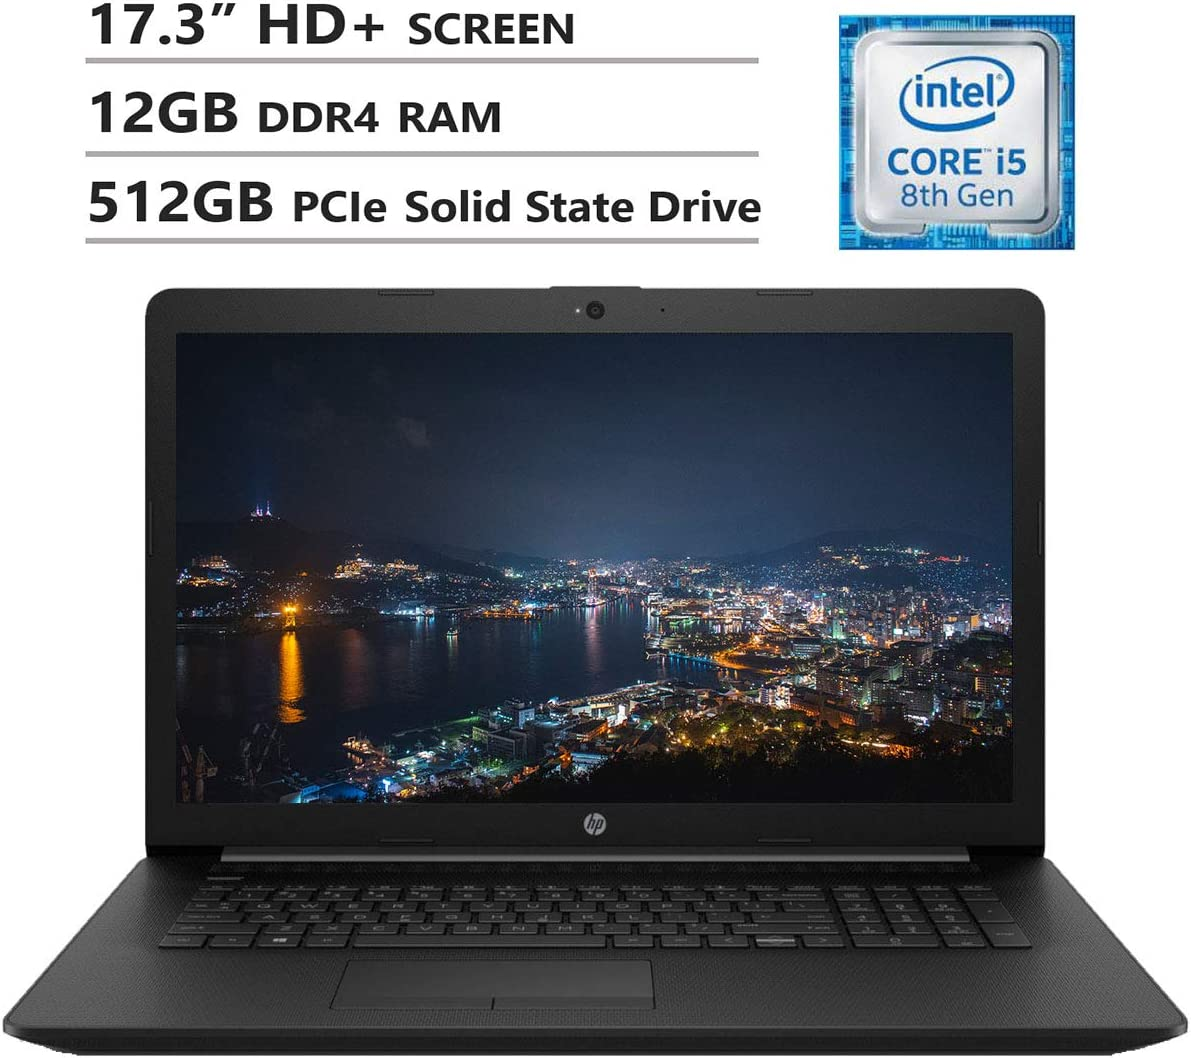 "HP Notebook 17.3"" HD+ Screen Laptop. Intel Core i5-8265U Up to 3.9GHz, 12GB DDR4 RAM, 512GB PCIe Solid State Drive, Wi-Fi+Bluetooth Combo, HDMI, USB 3.0, RJ-45, DVD-RW, Windows 10, Black"